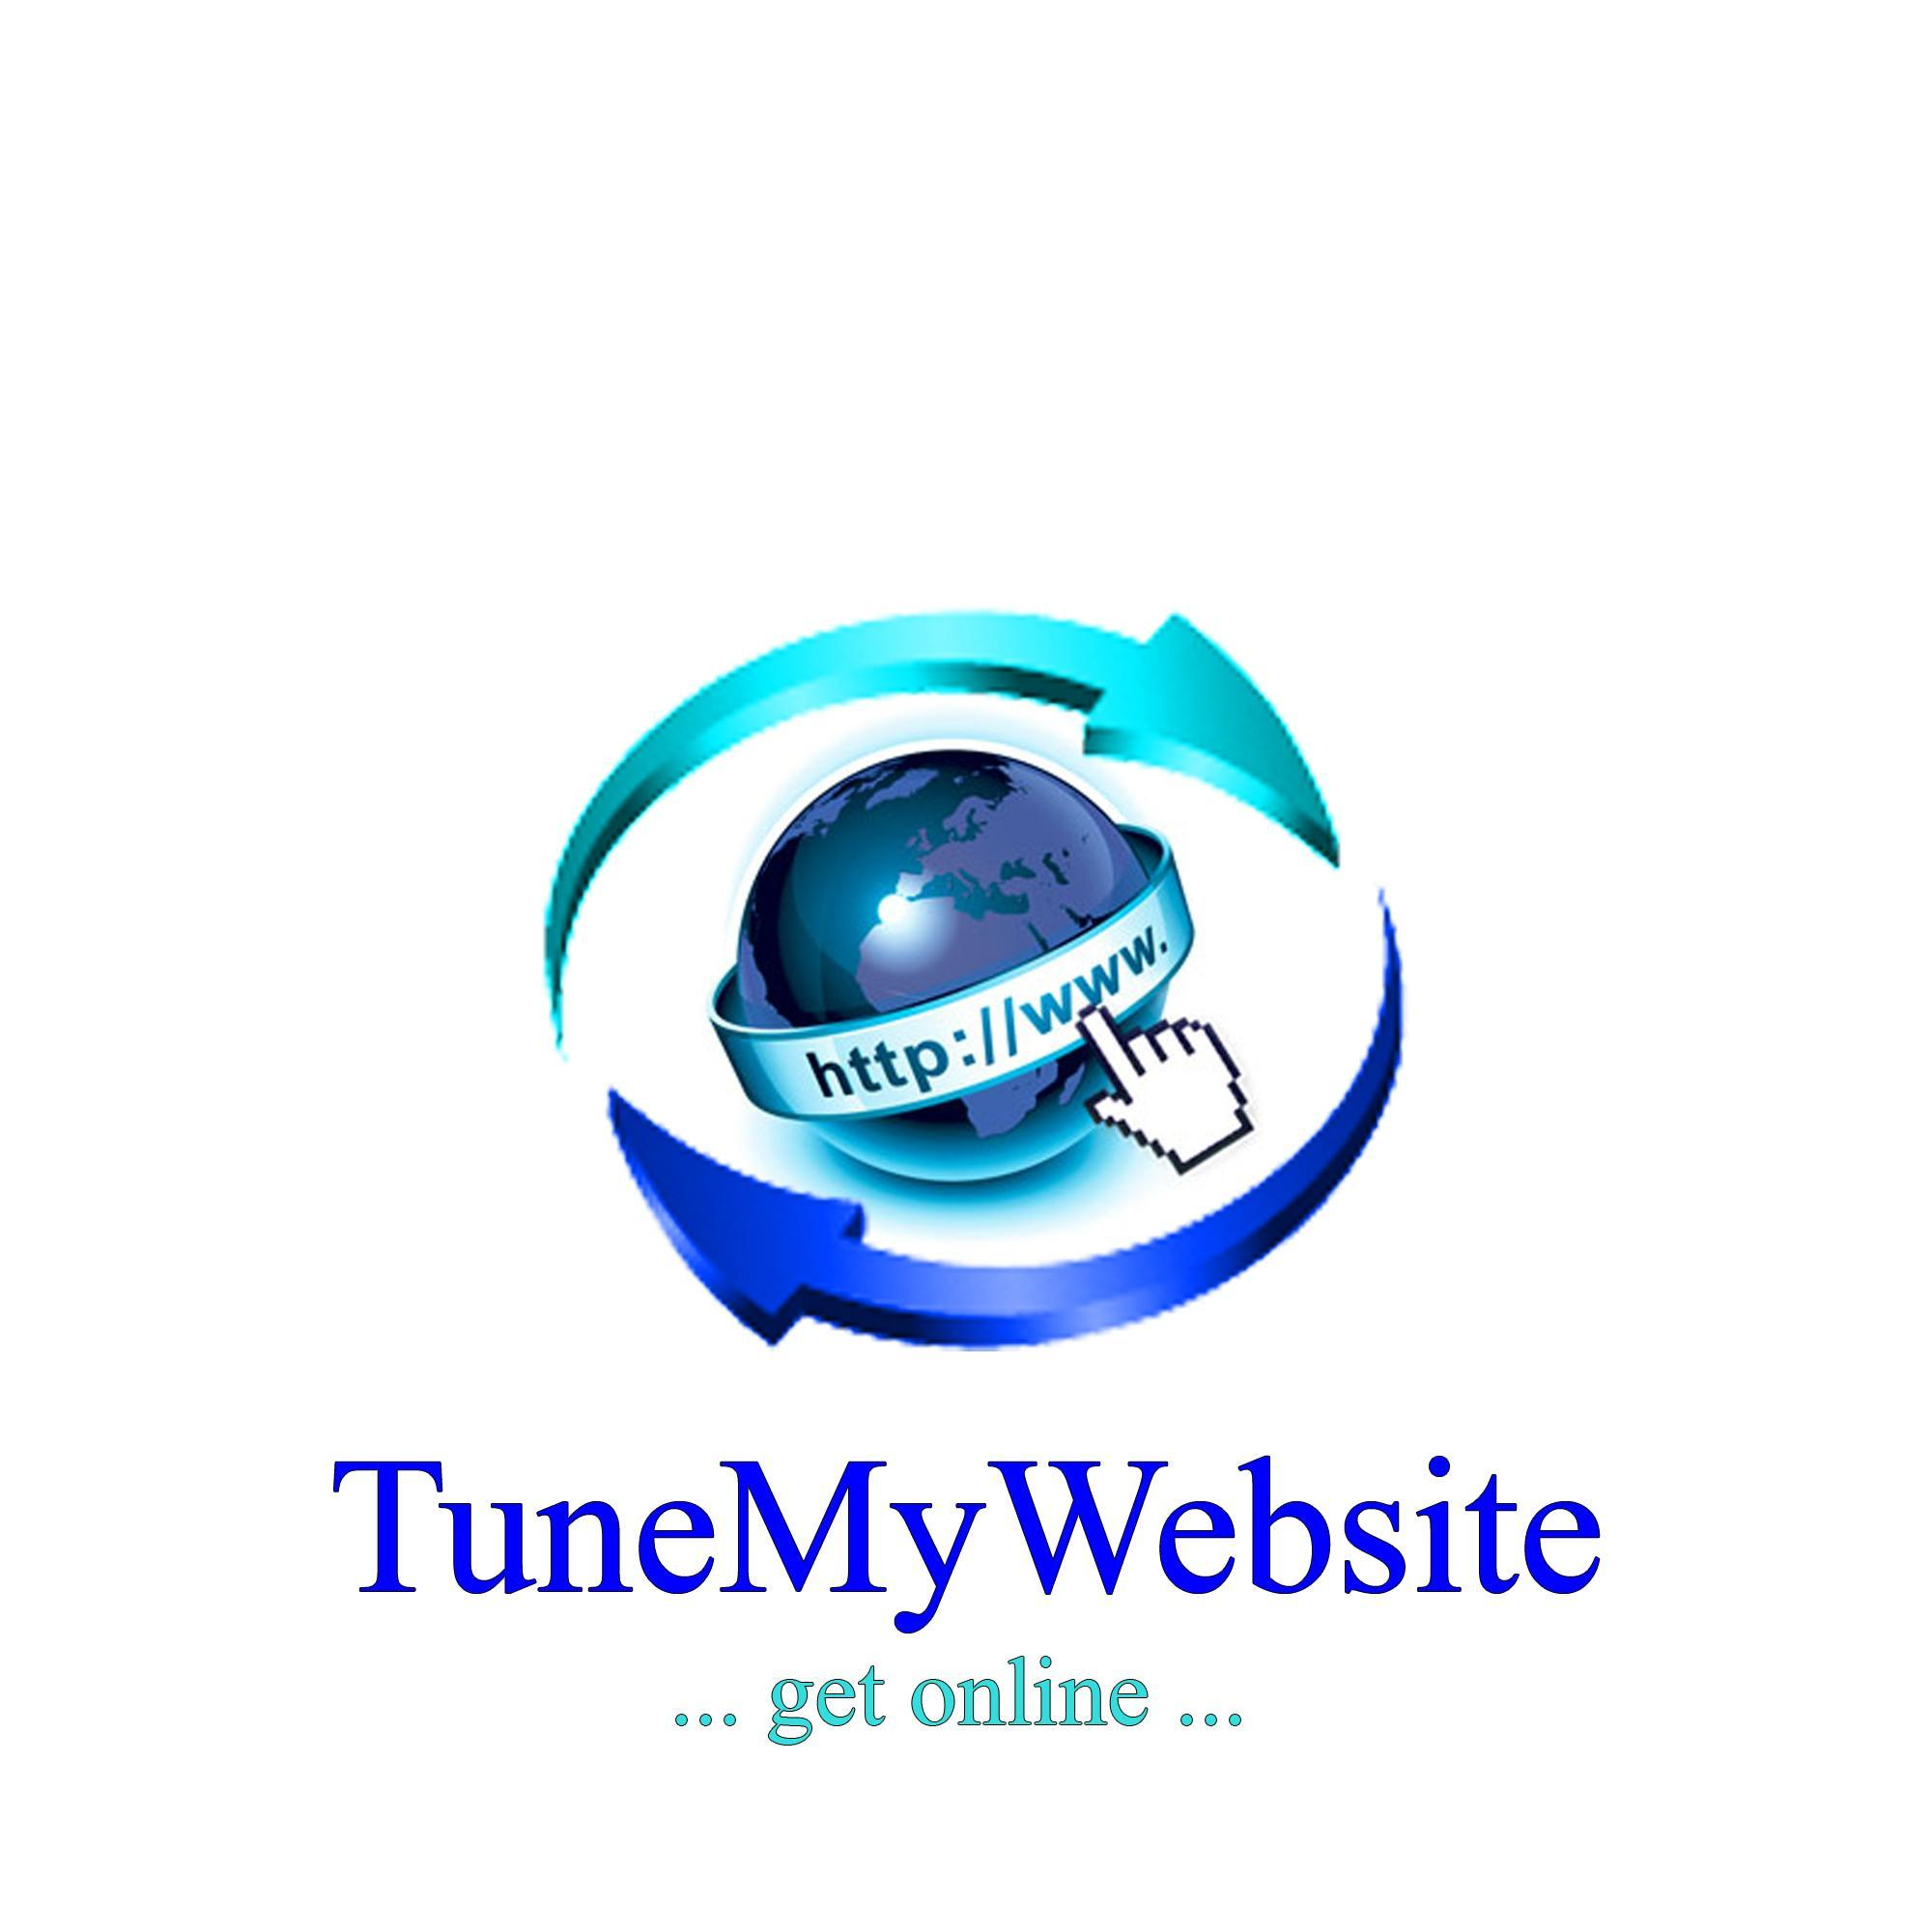 @tunemywebsite